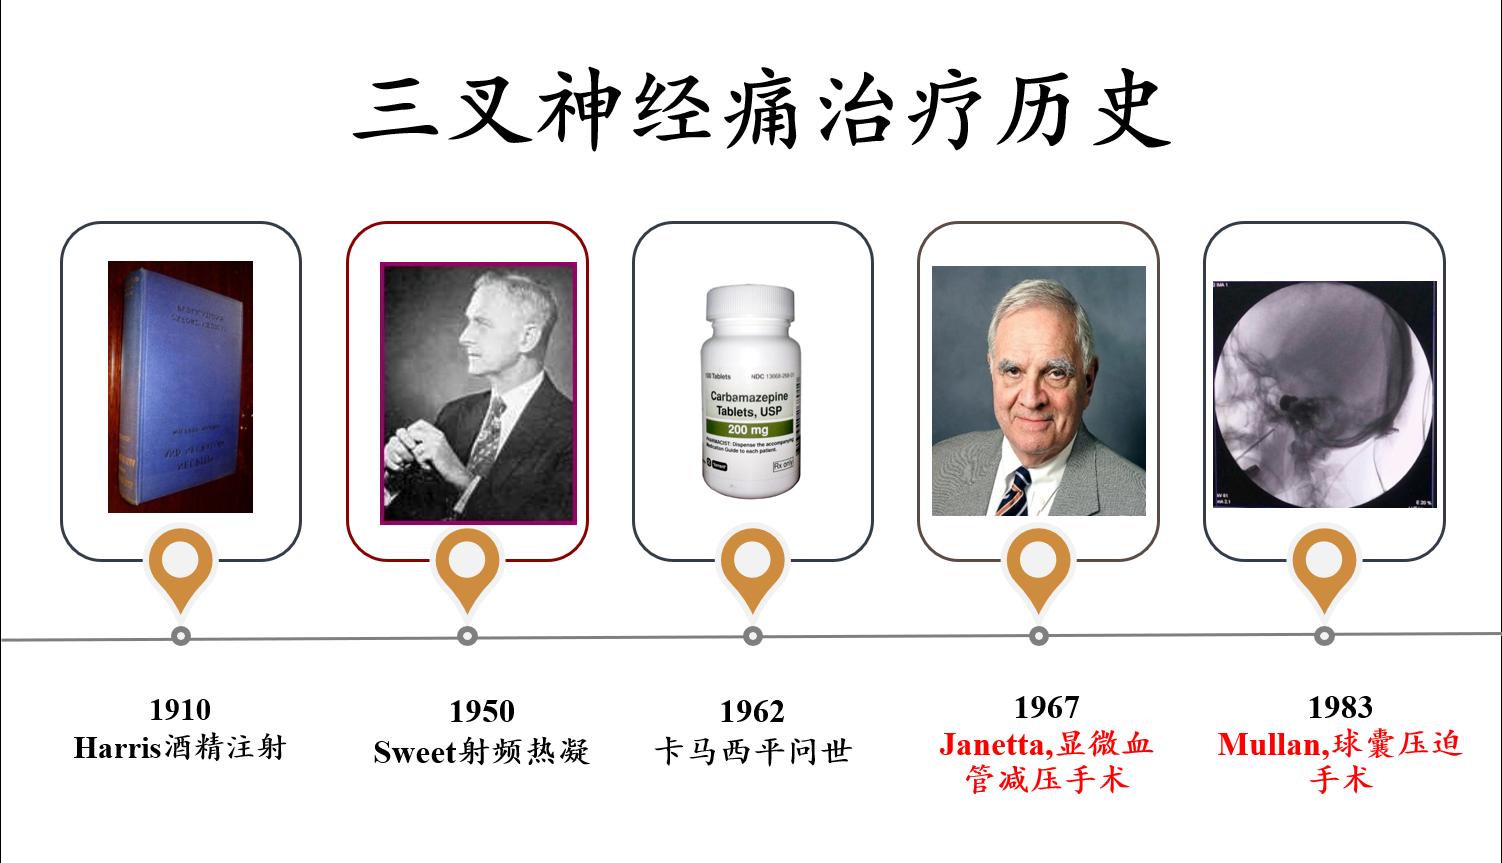 <a href='//www.haodf.com/jibing/sanchashenjingtong.htm' style='text-decoration:none;' target='_blank'>三叉神经痛</a>治疗历史.png